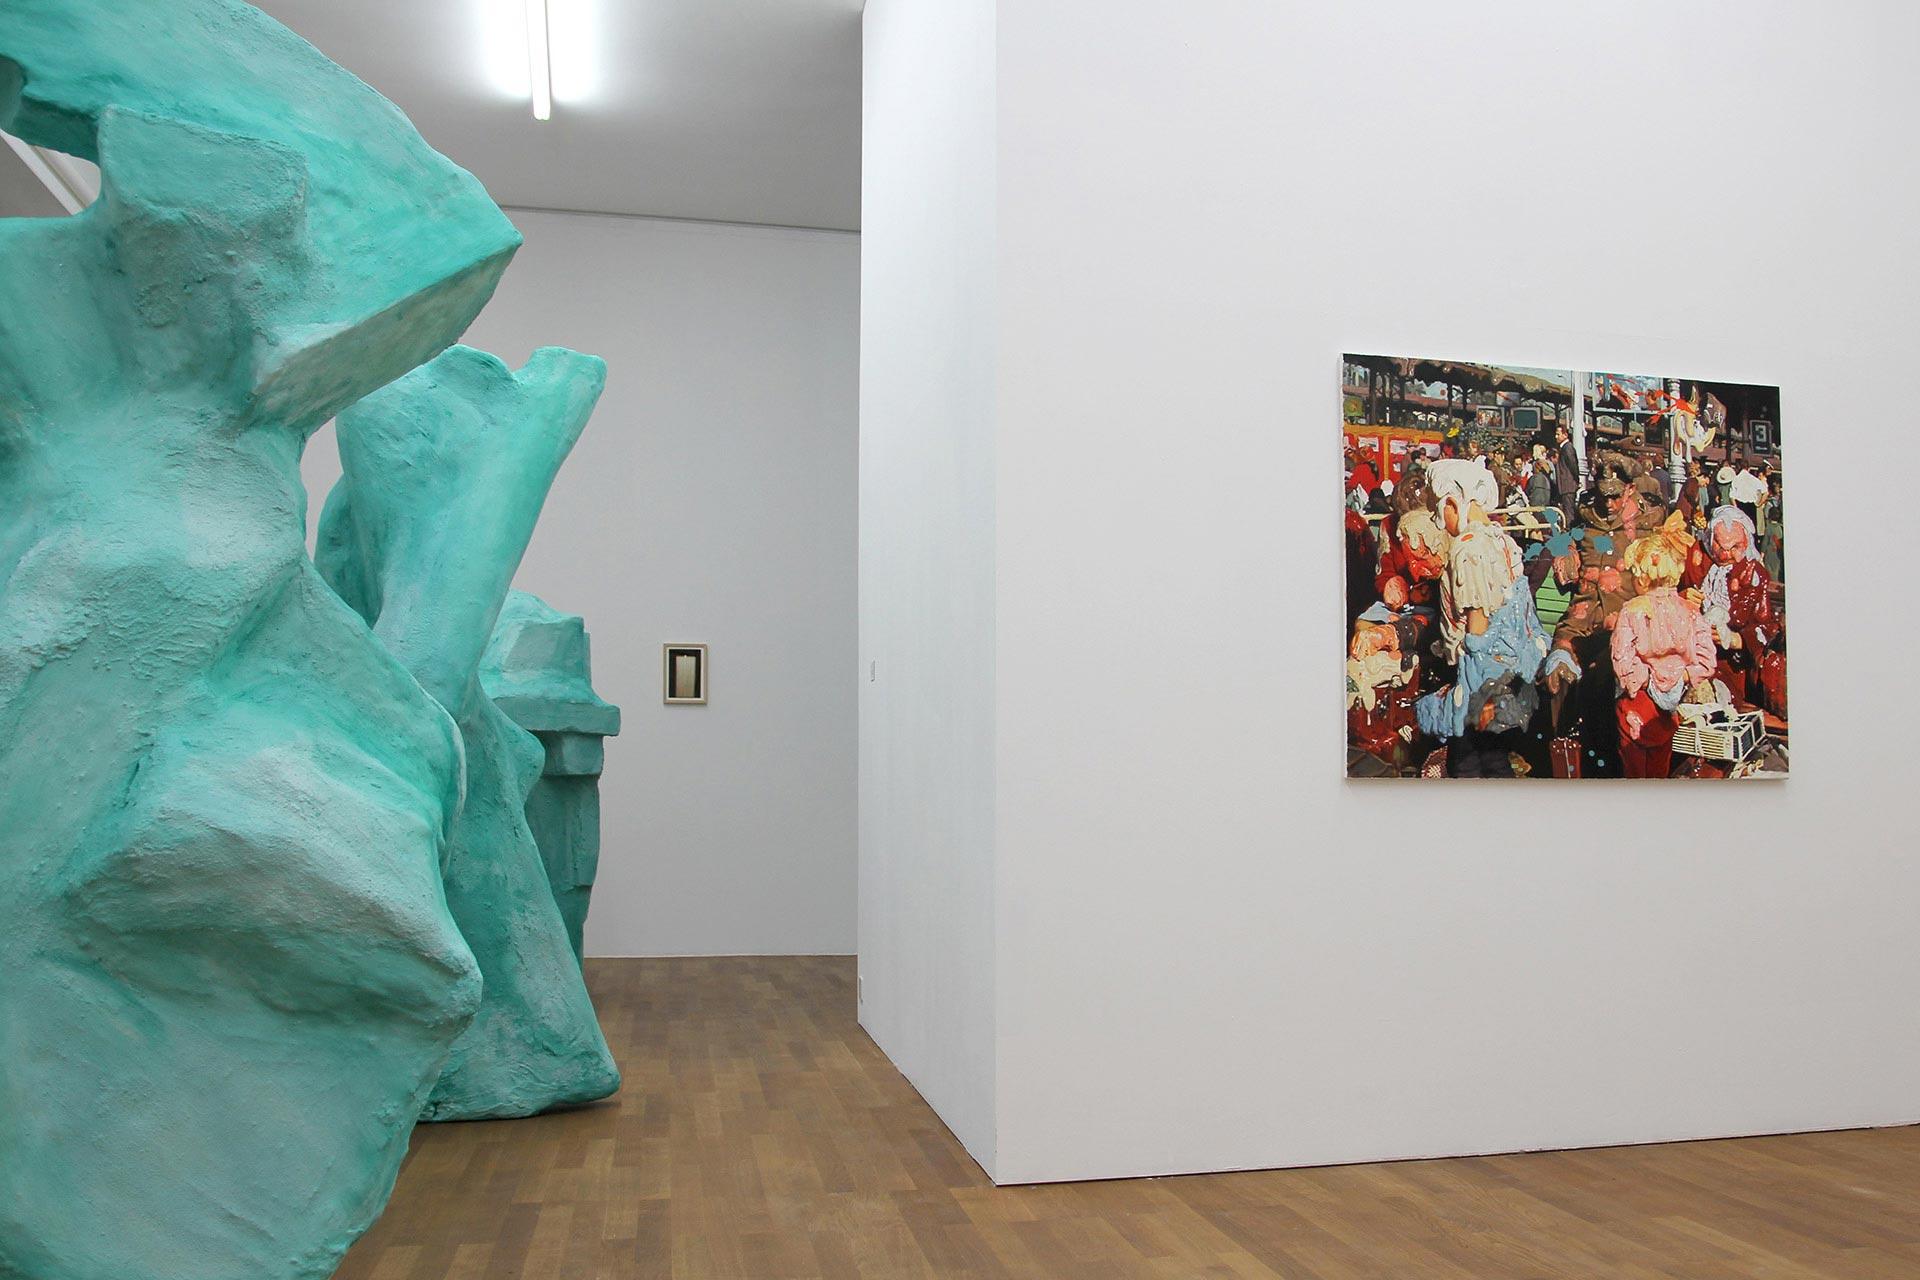 Dezemberausstellung-Kunsthalle-Winterthur-2015-3.jpg